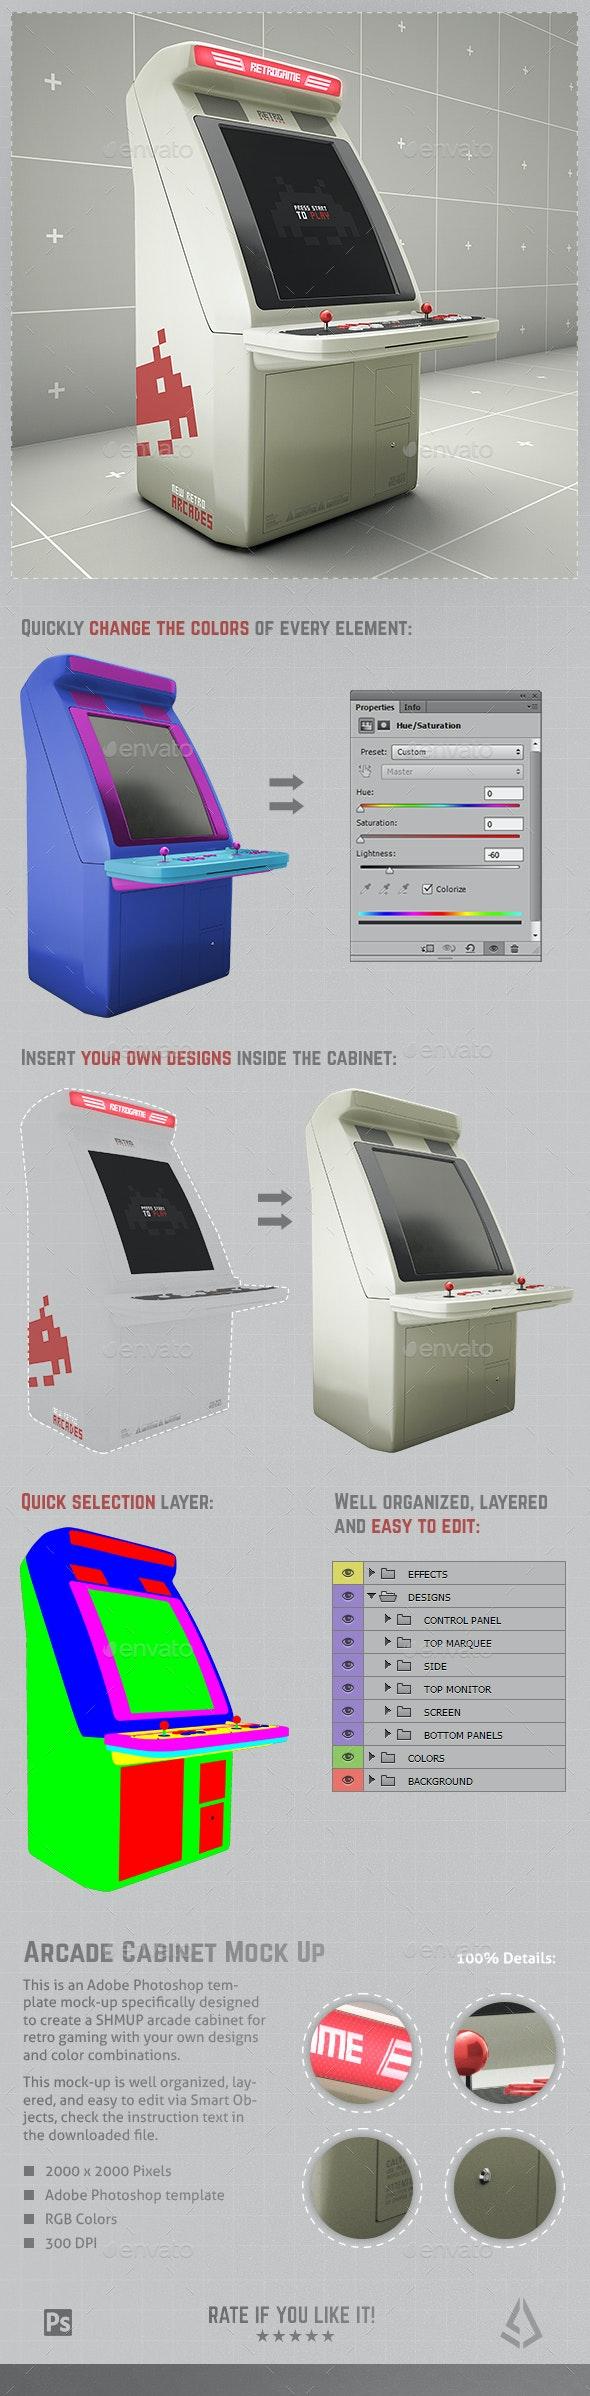 Retro Gaming Arcade SHMUP Cabinet Mockup Template - Miscellaneous Print